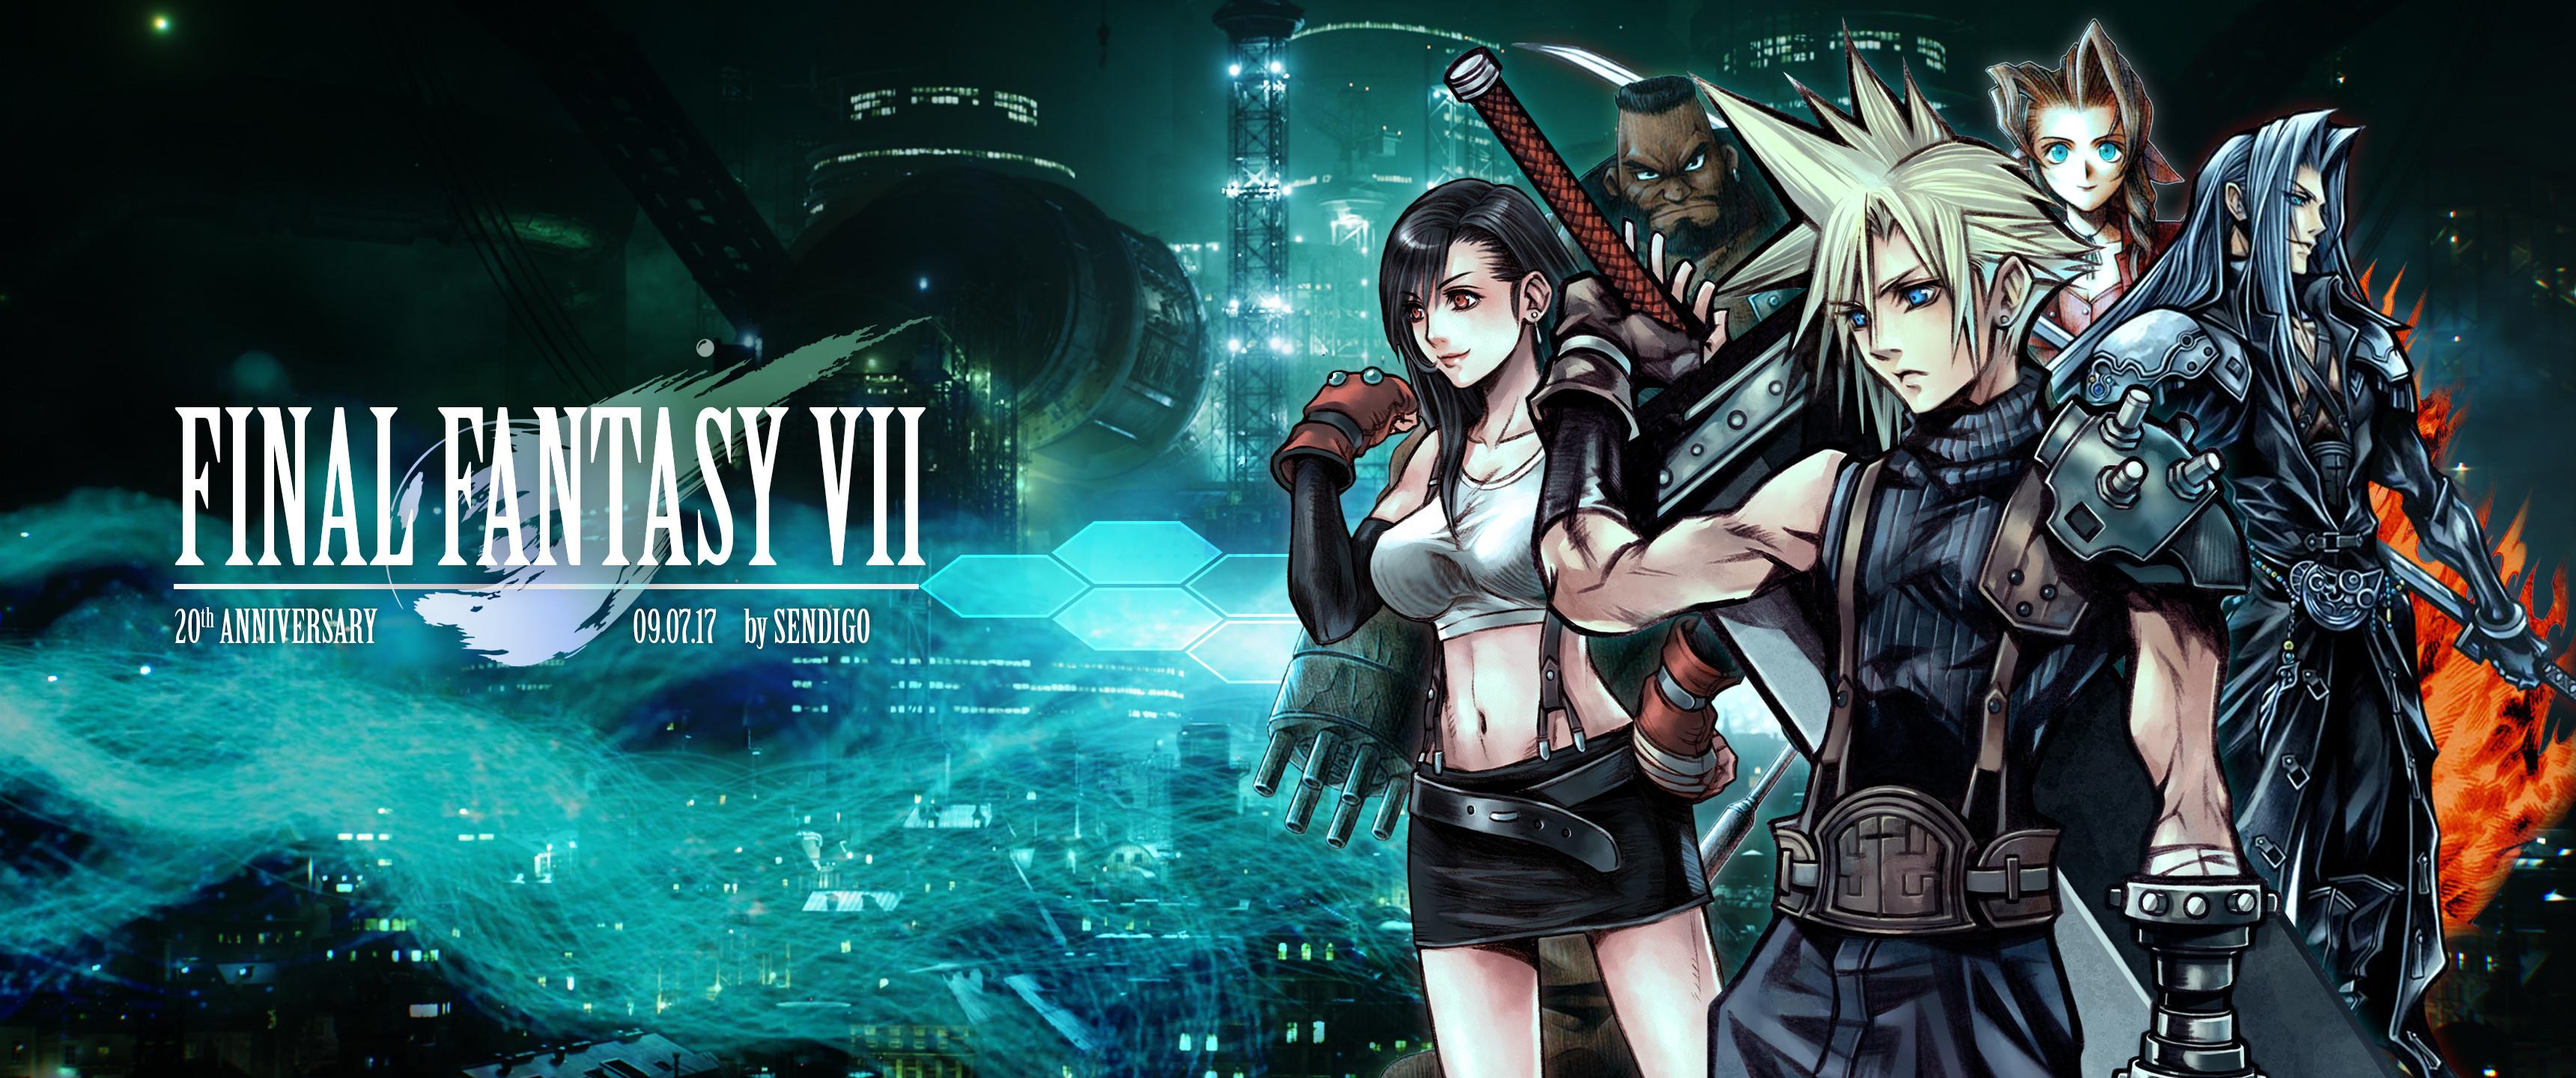 Final Fantasy VII 20th Anniversary Wallpaper By Sendigo